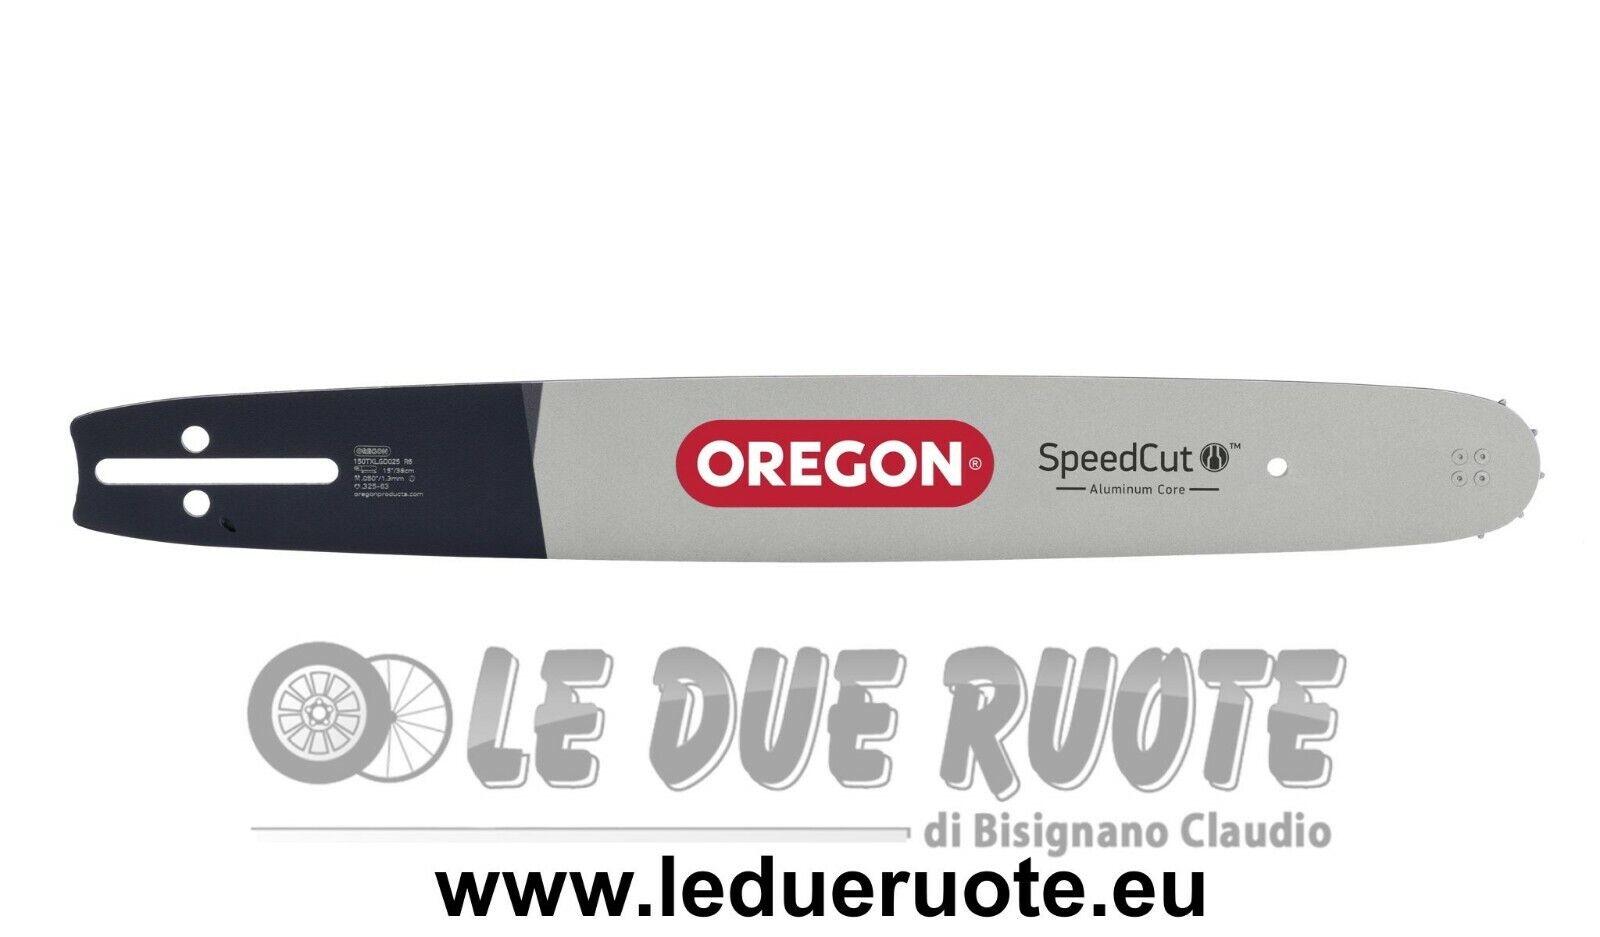 Barra Oregon Motosierra Husqvarna 3120 Speed Cut™ 38 40 43 45 50 cm Original